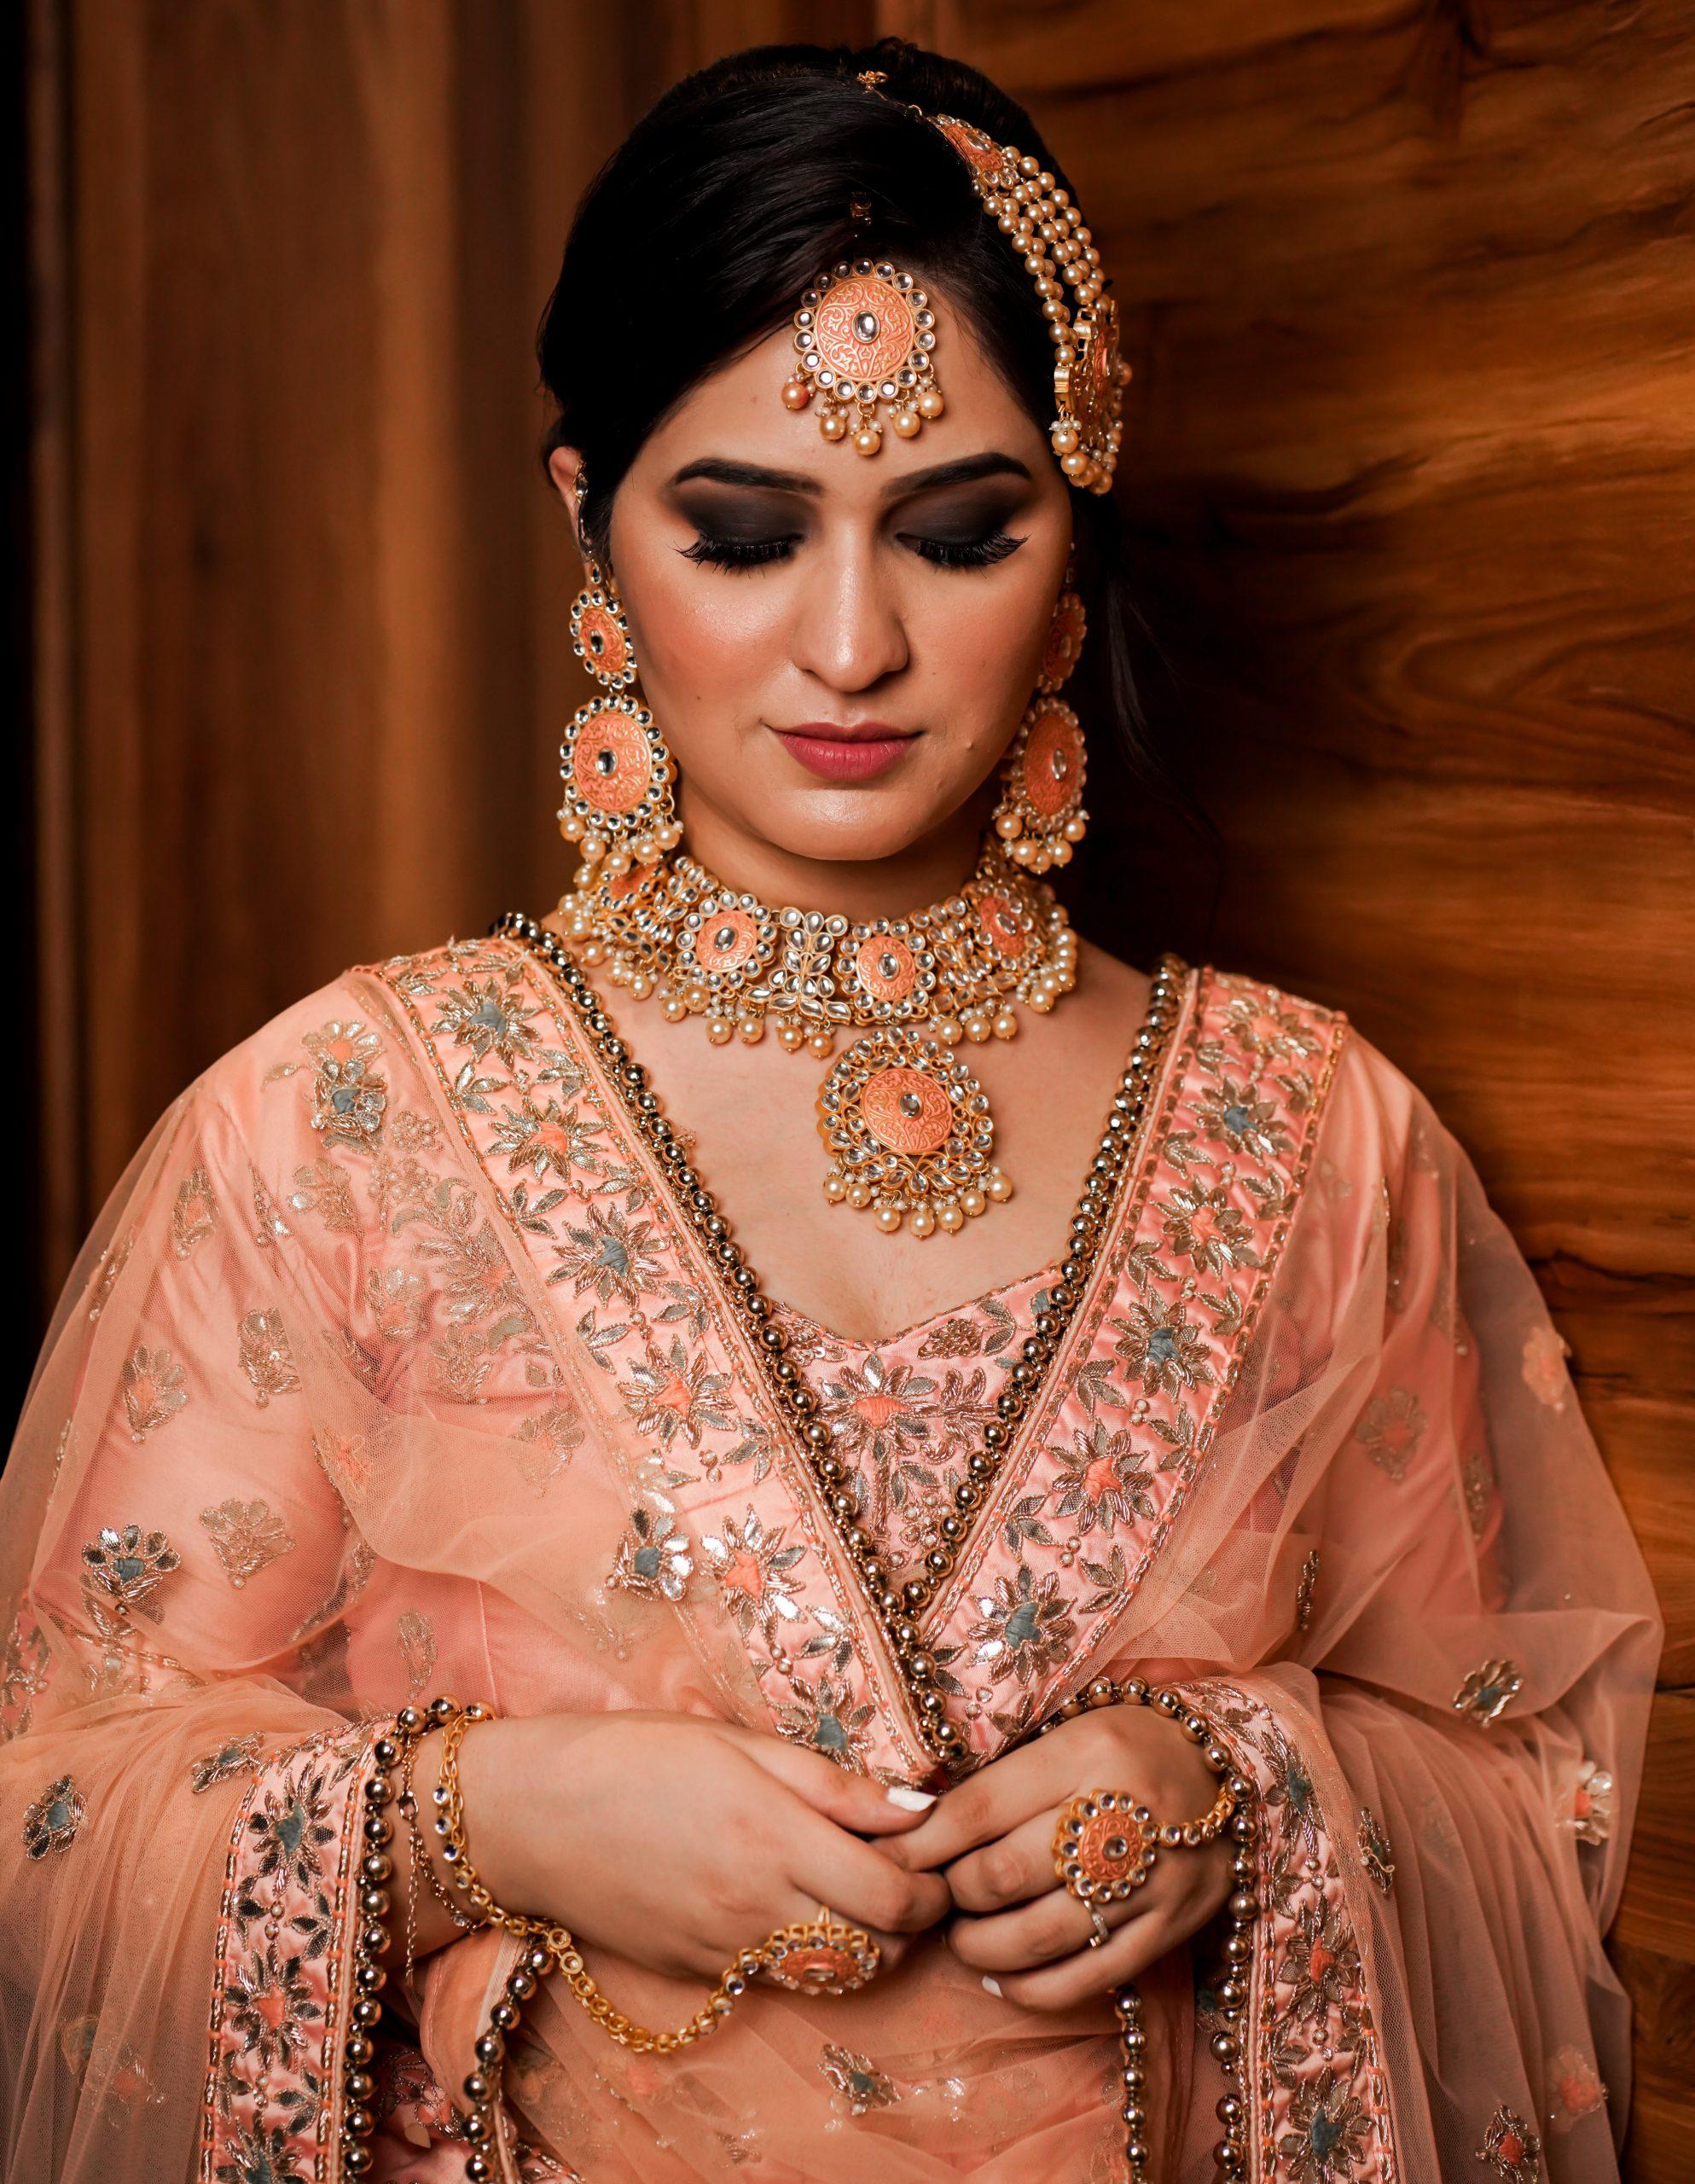 Beauty of a Punjabi Girl